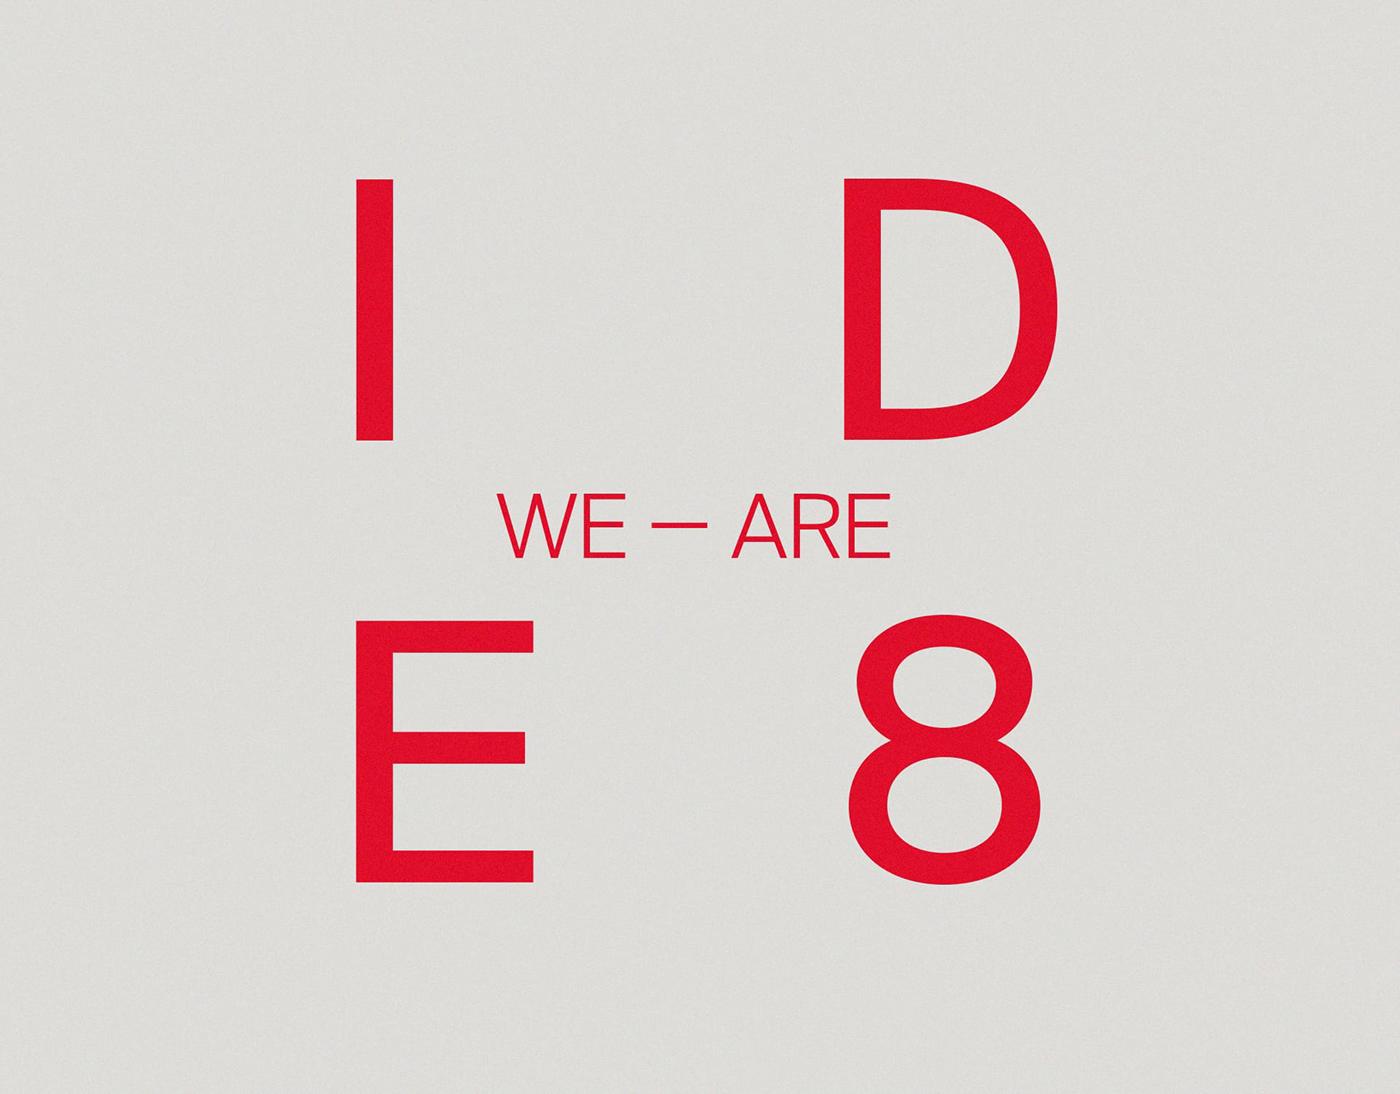 brand identity branding  logo graphic design  editorial editorial design  Web Design  Website Photography  typography